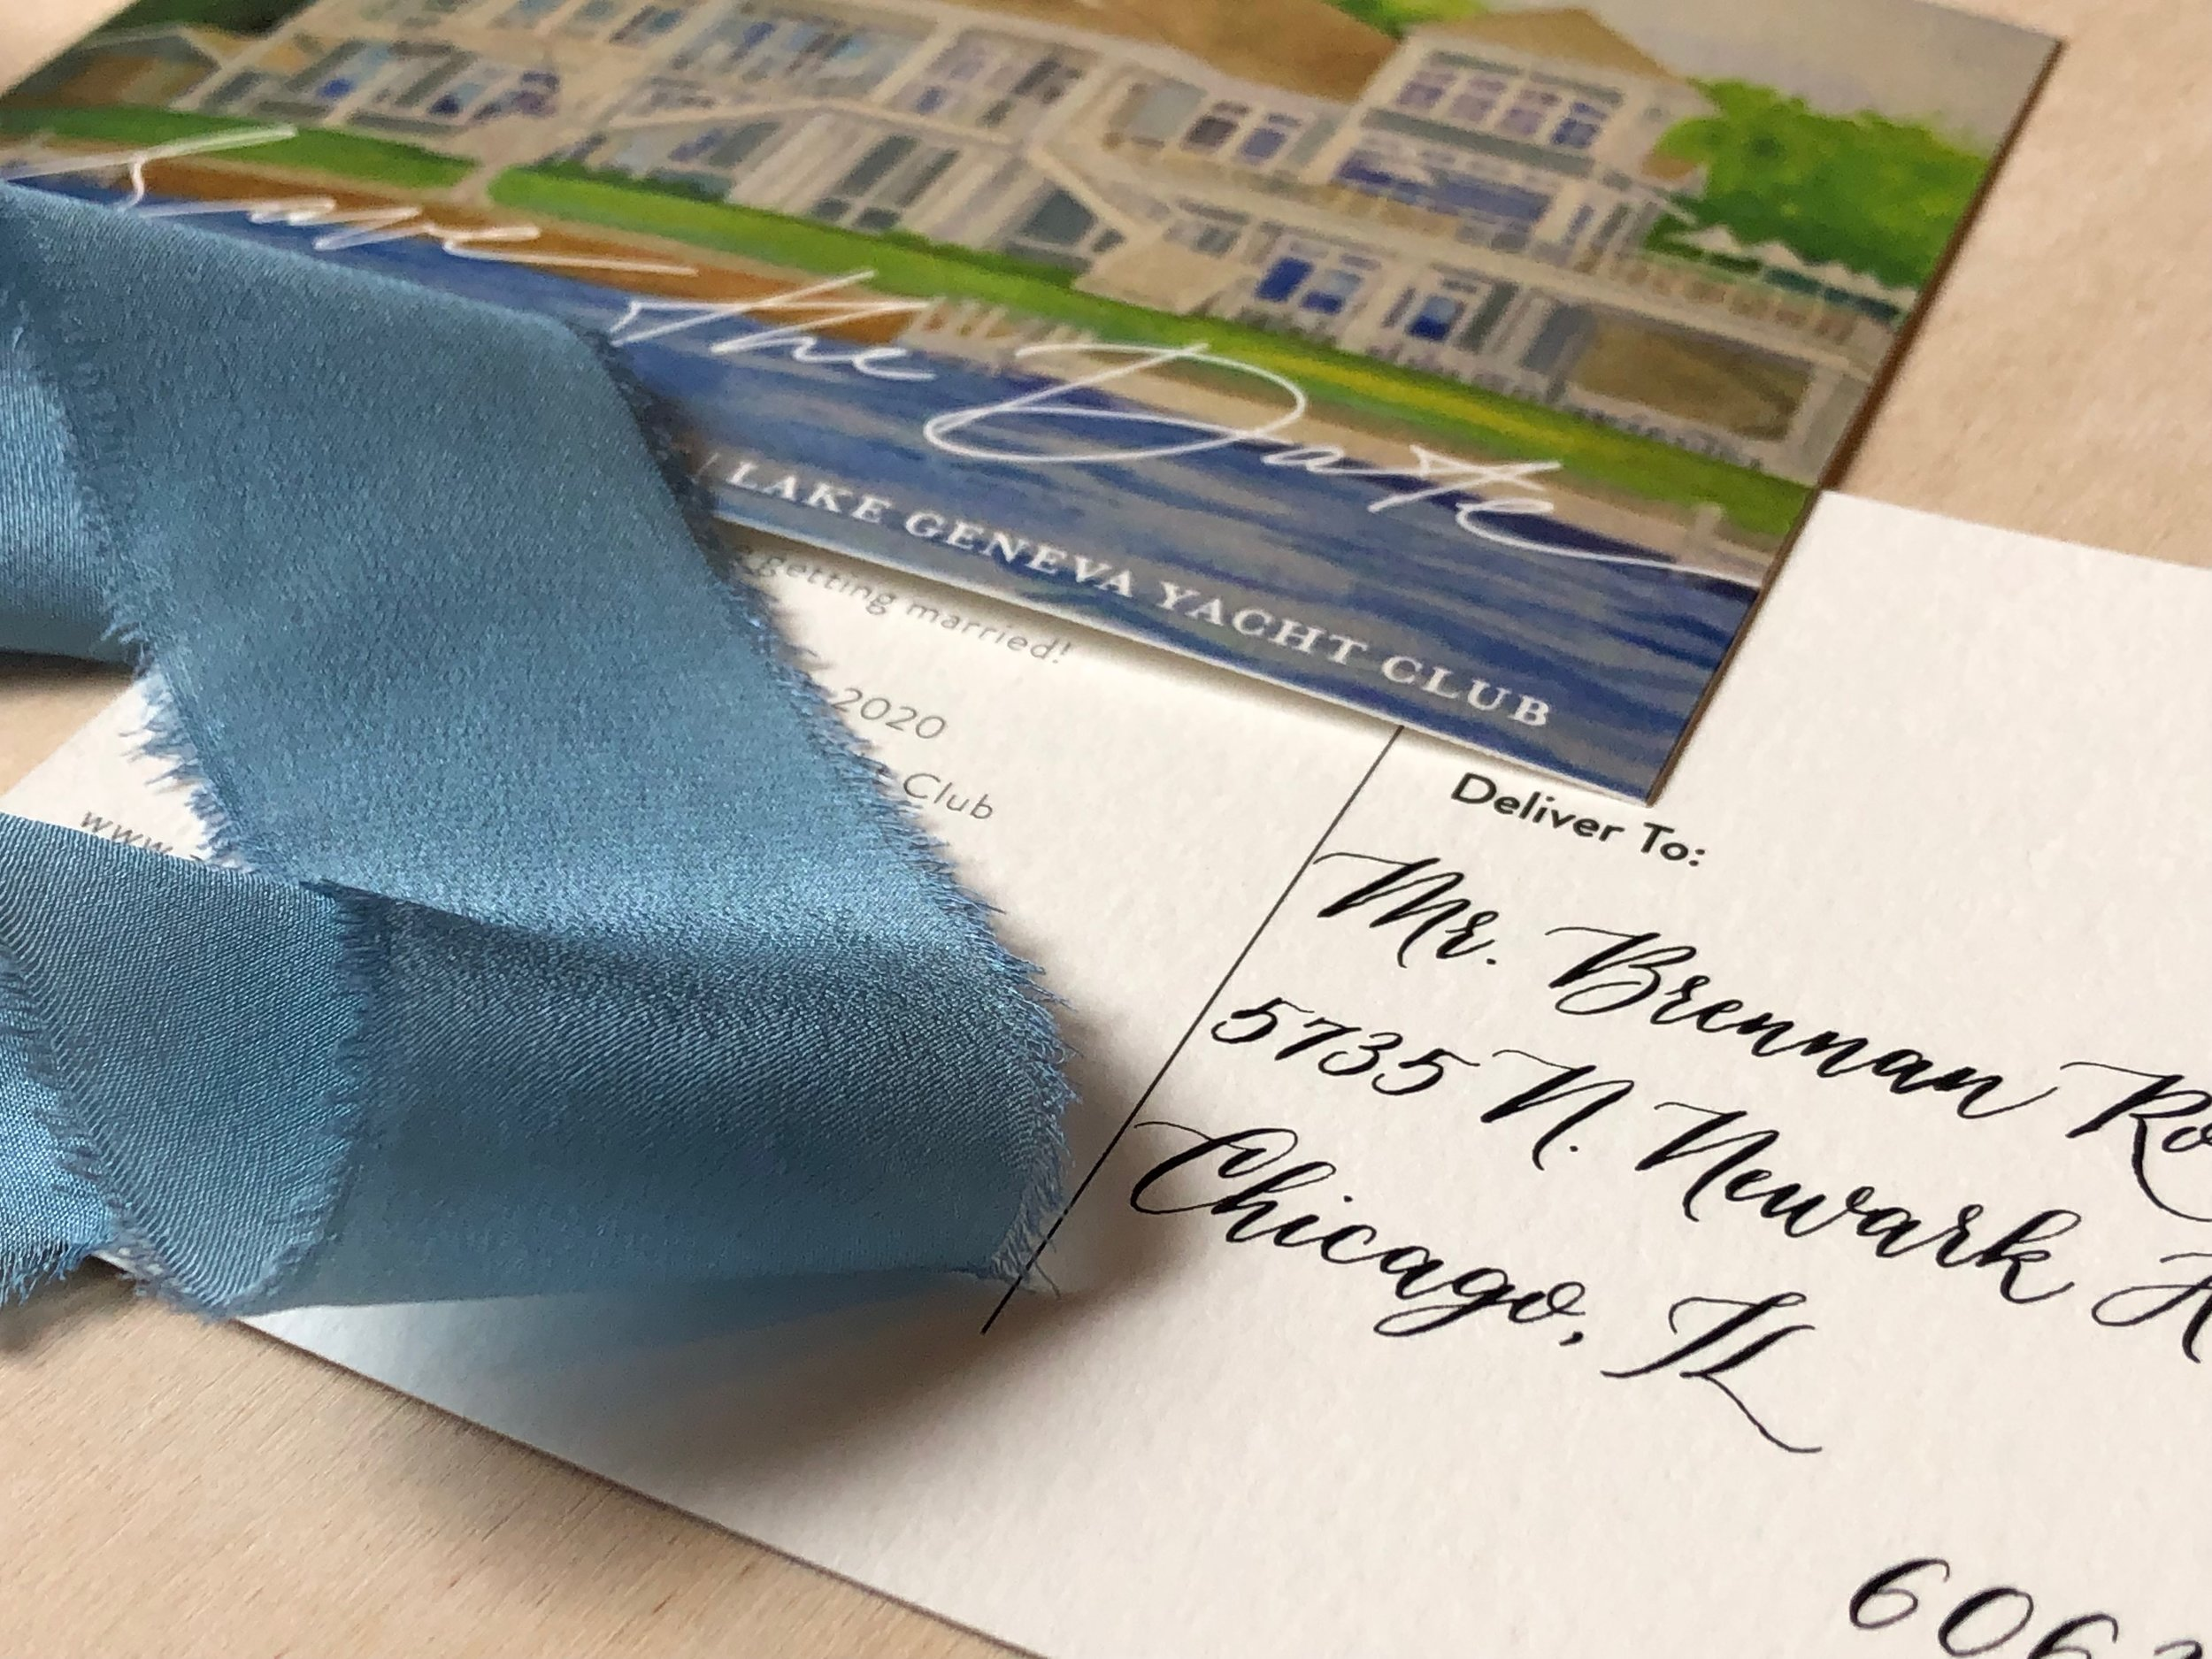 Comeau postcards (1).JPG